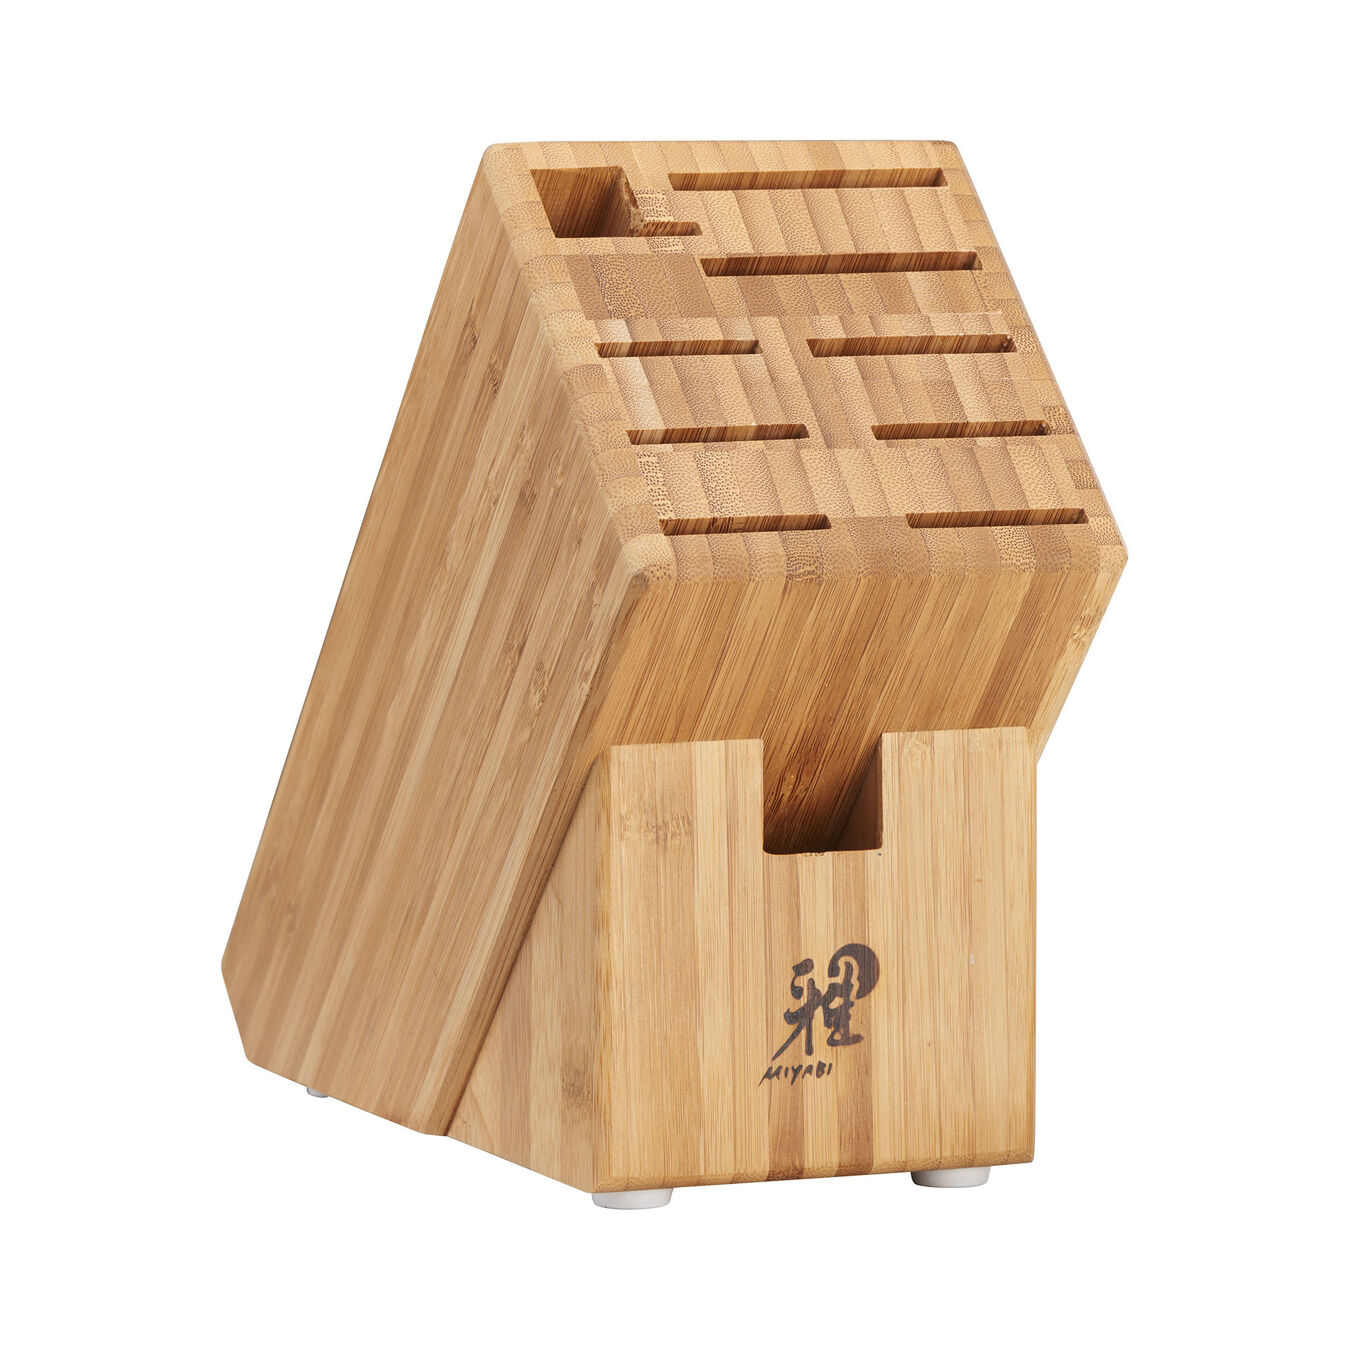 7-pc Knife Block Set,,large 3